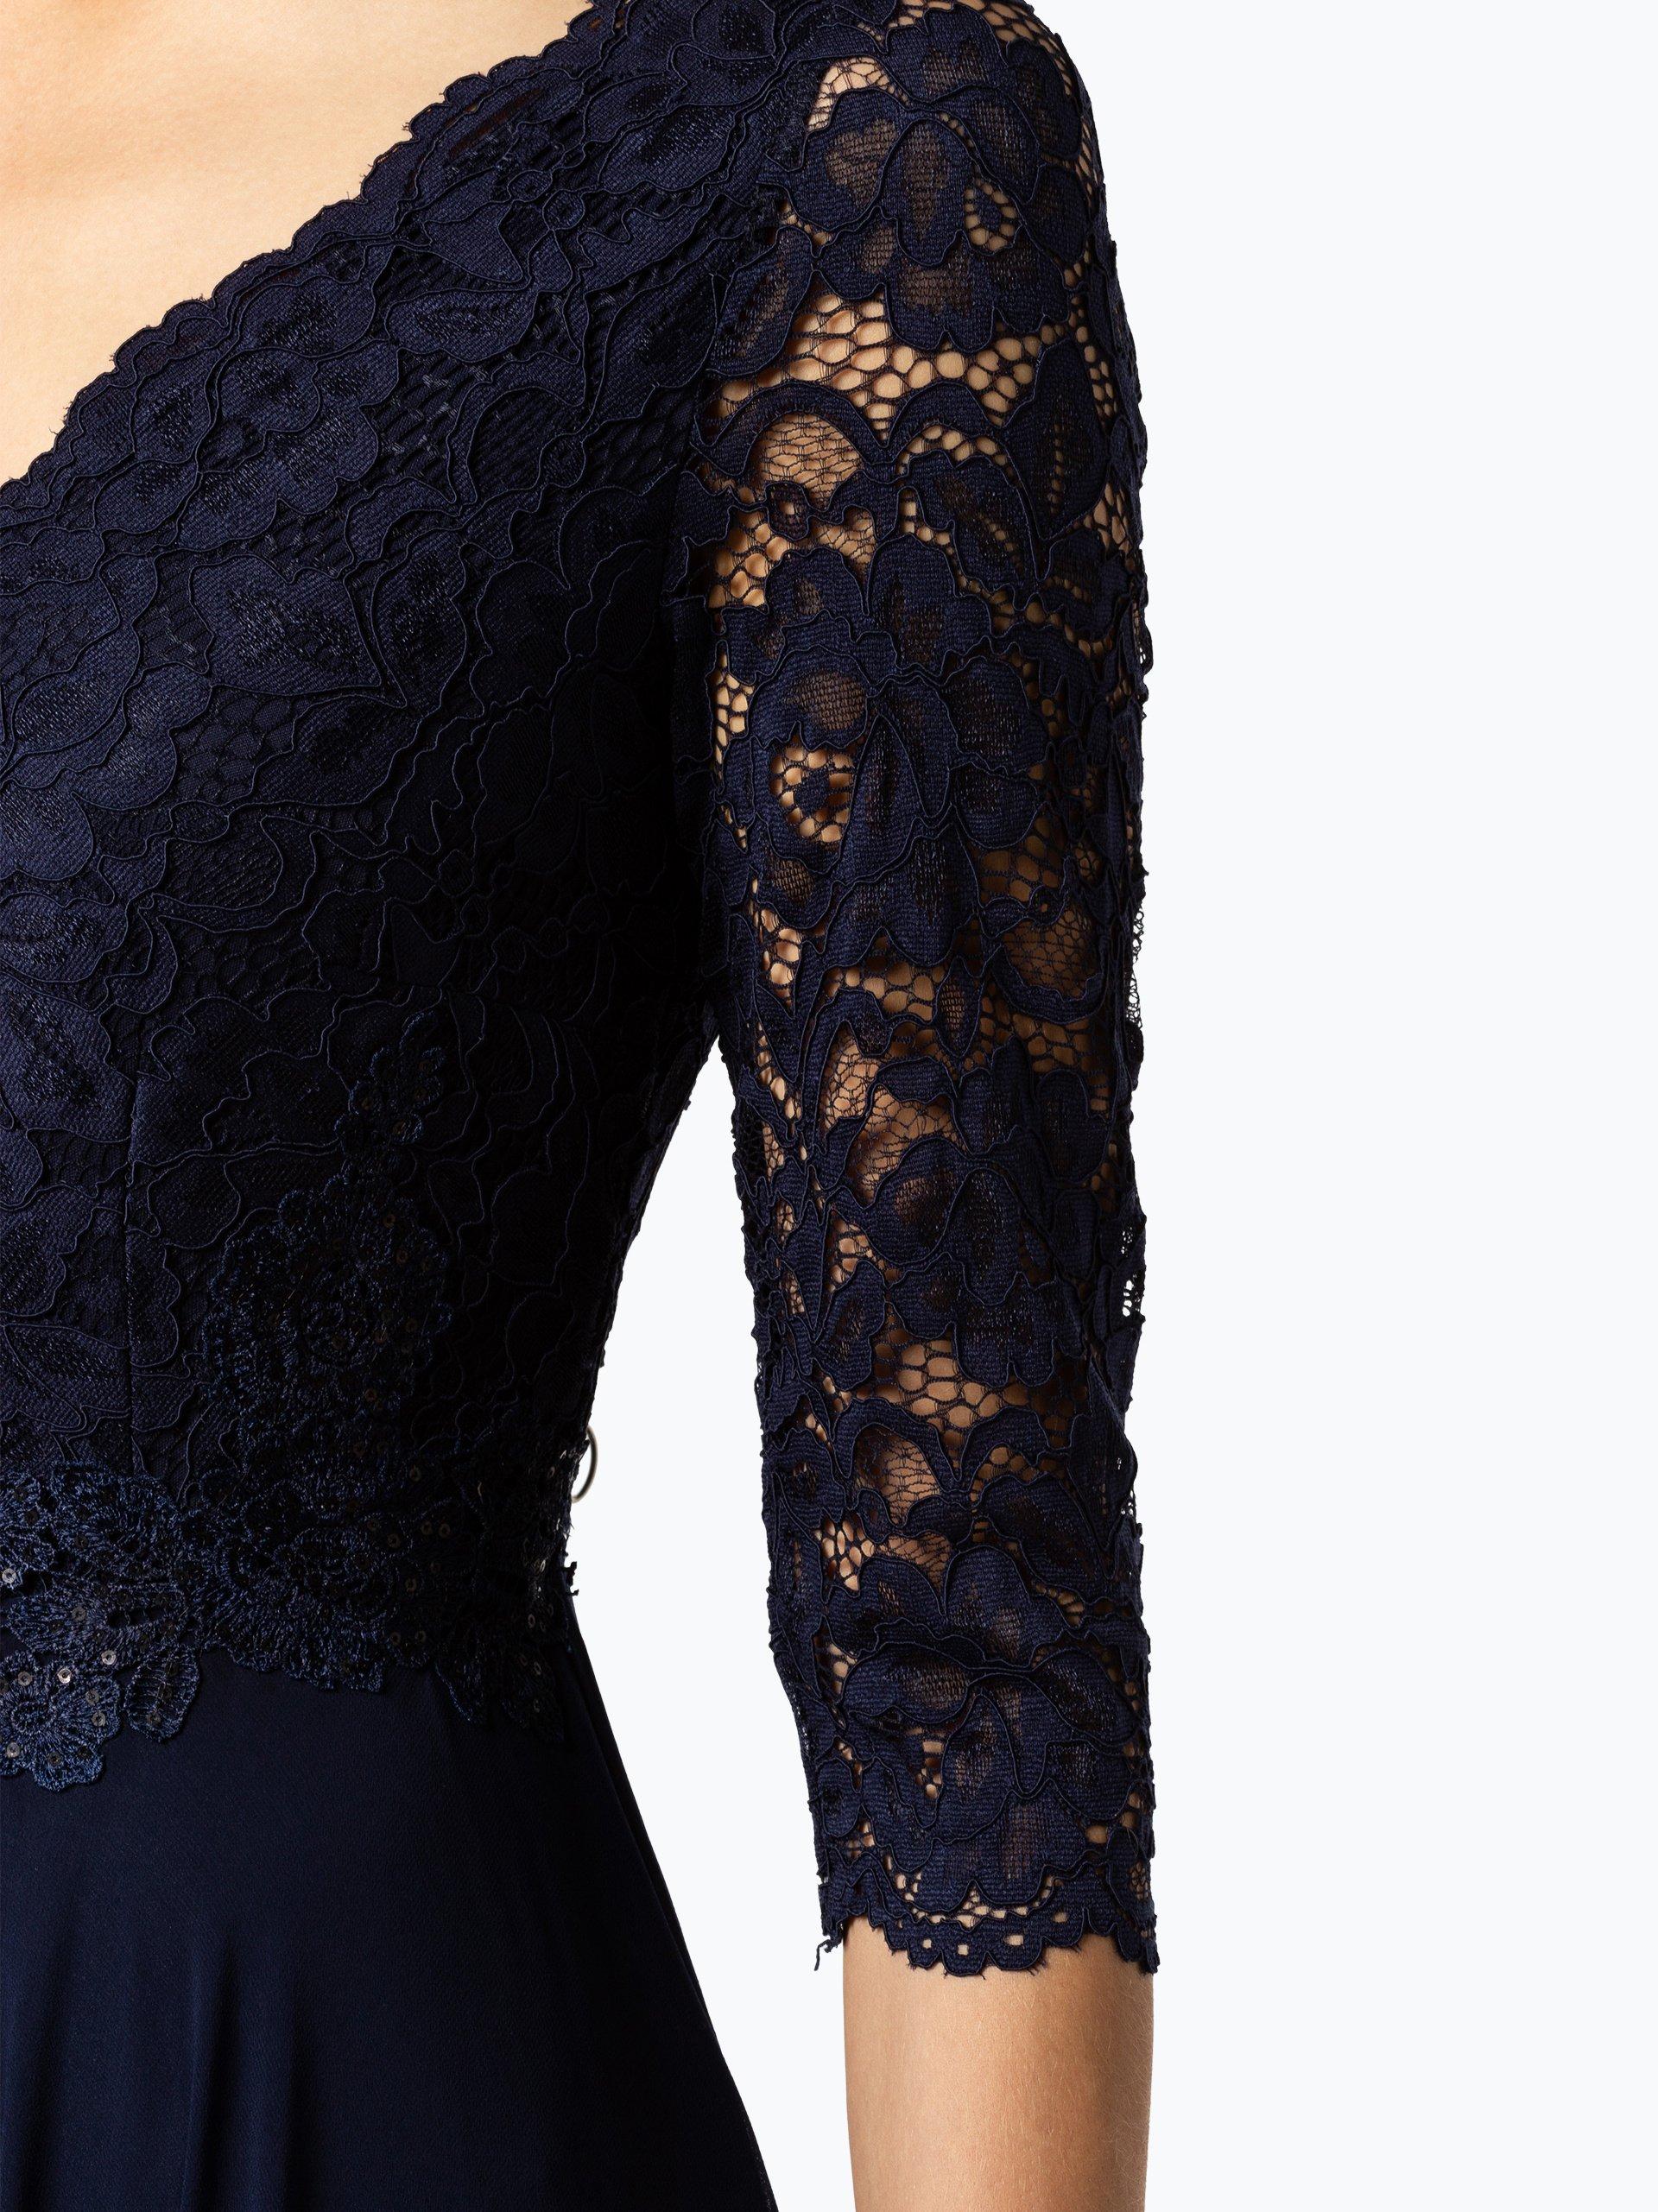 Vera Mont Collection Damska sukienka wieczorowa